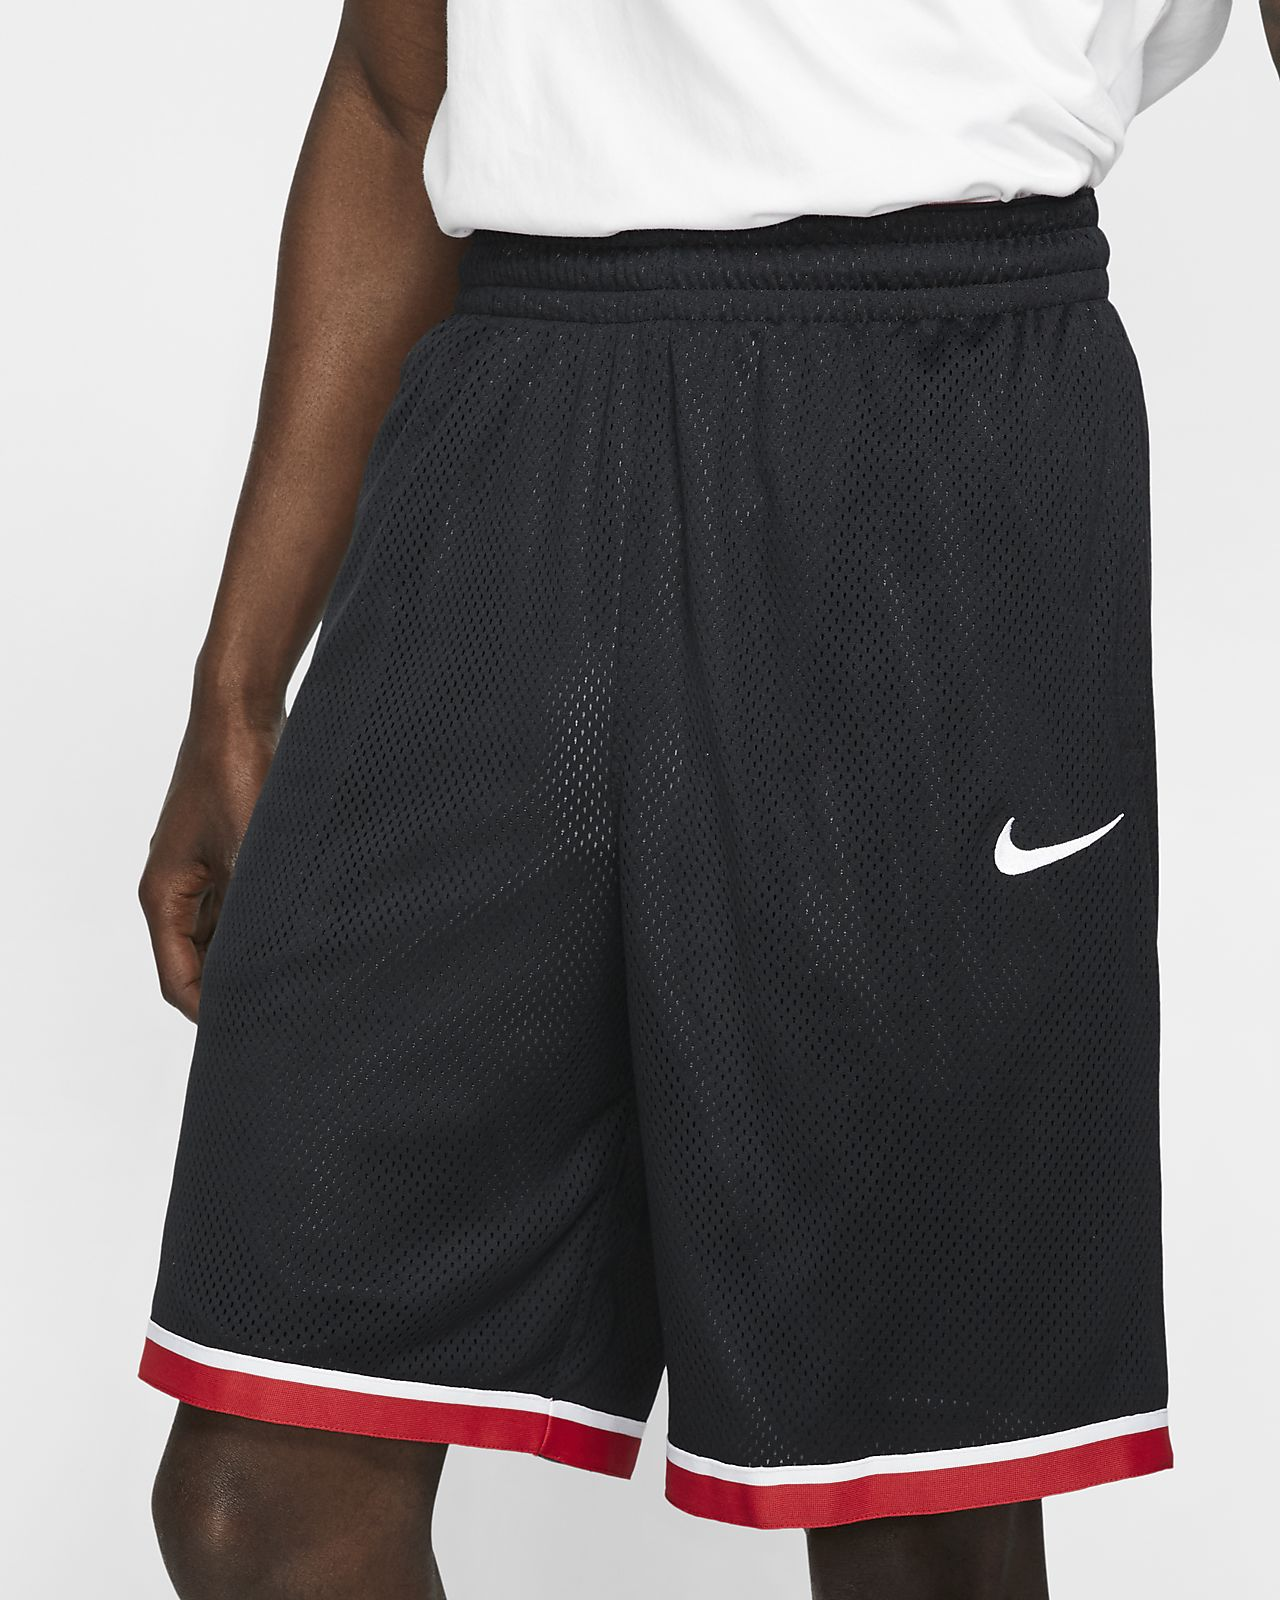 Nike Dri-FIT Classic Pantalón corto de baloncesto - Hombre